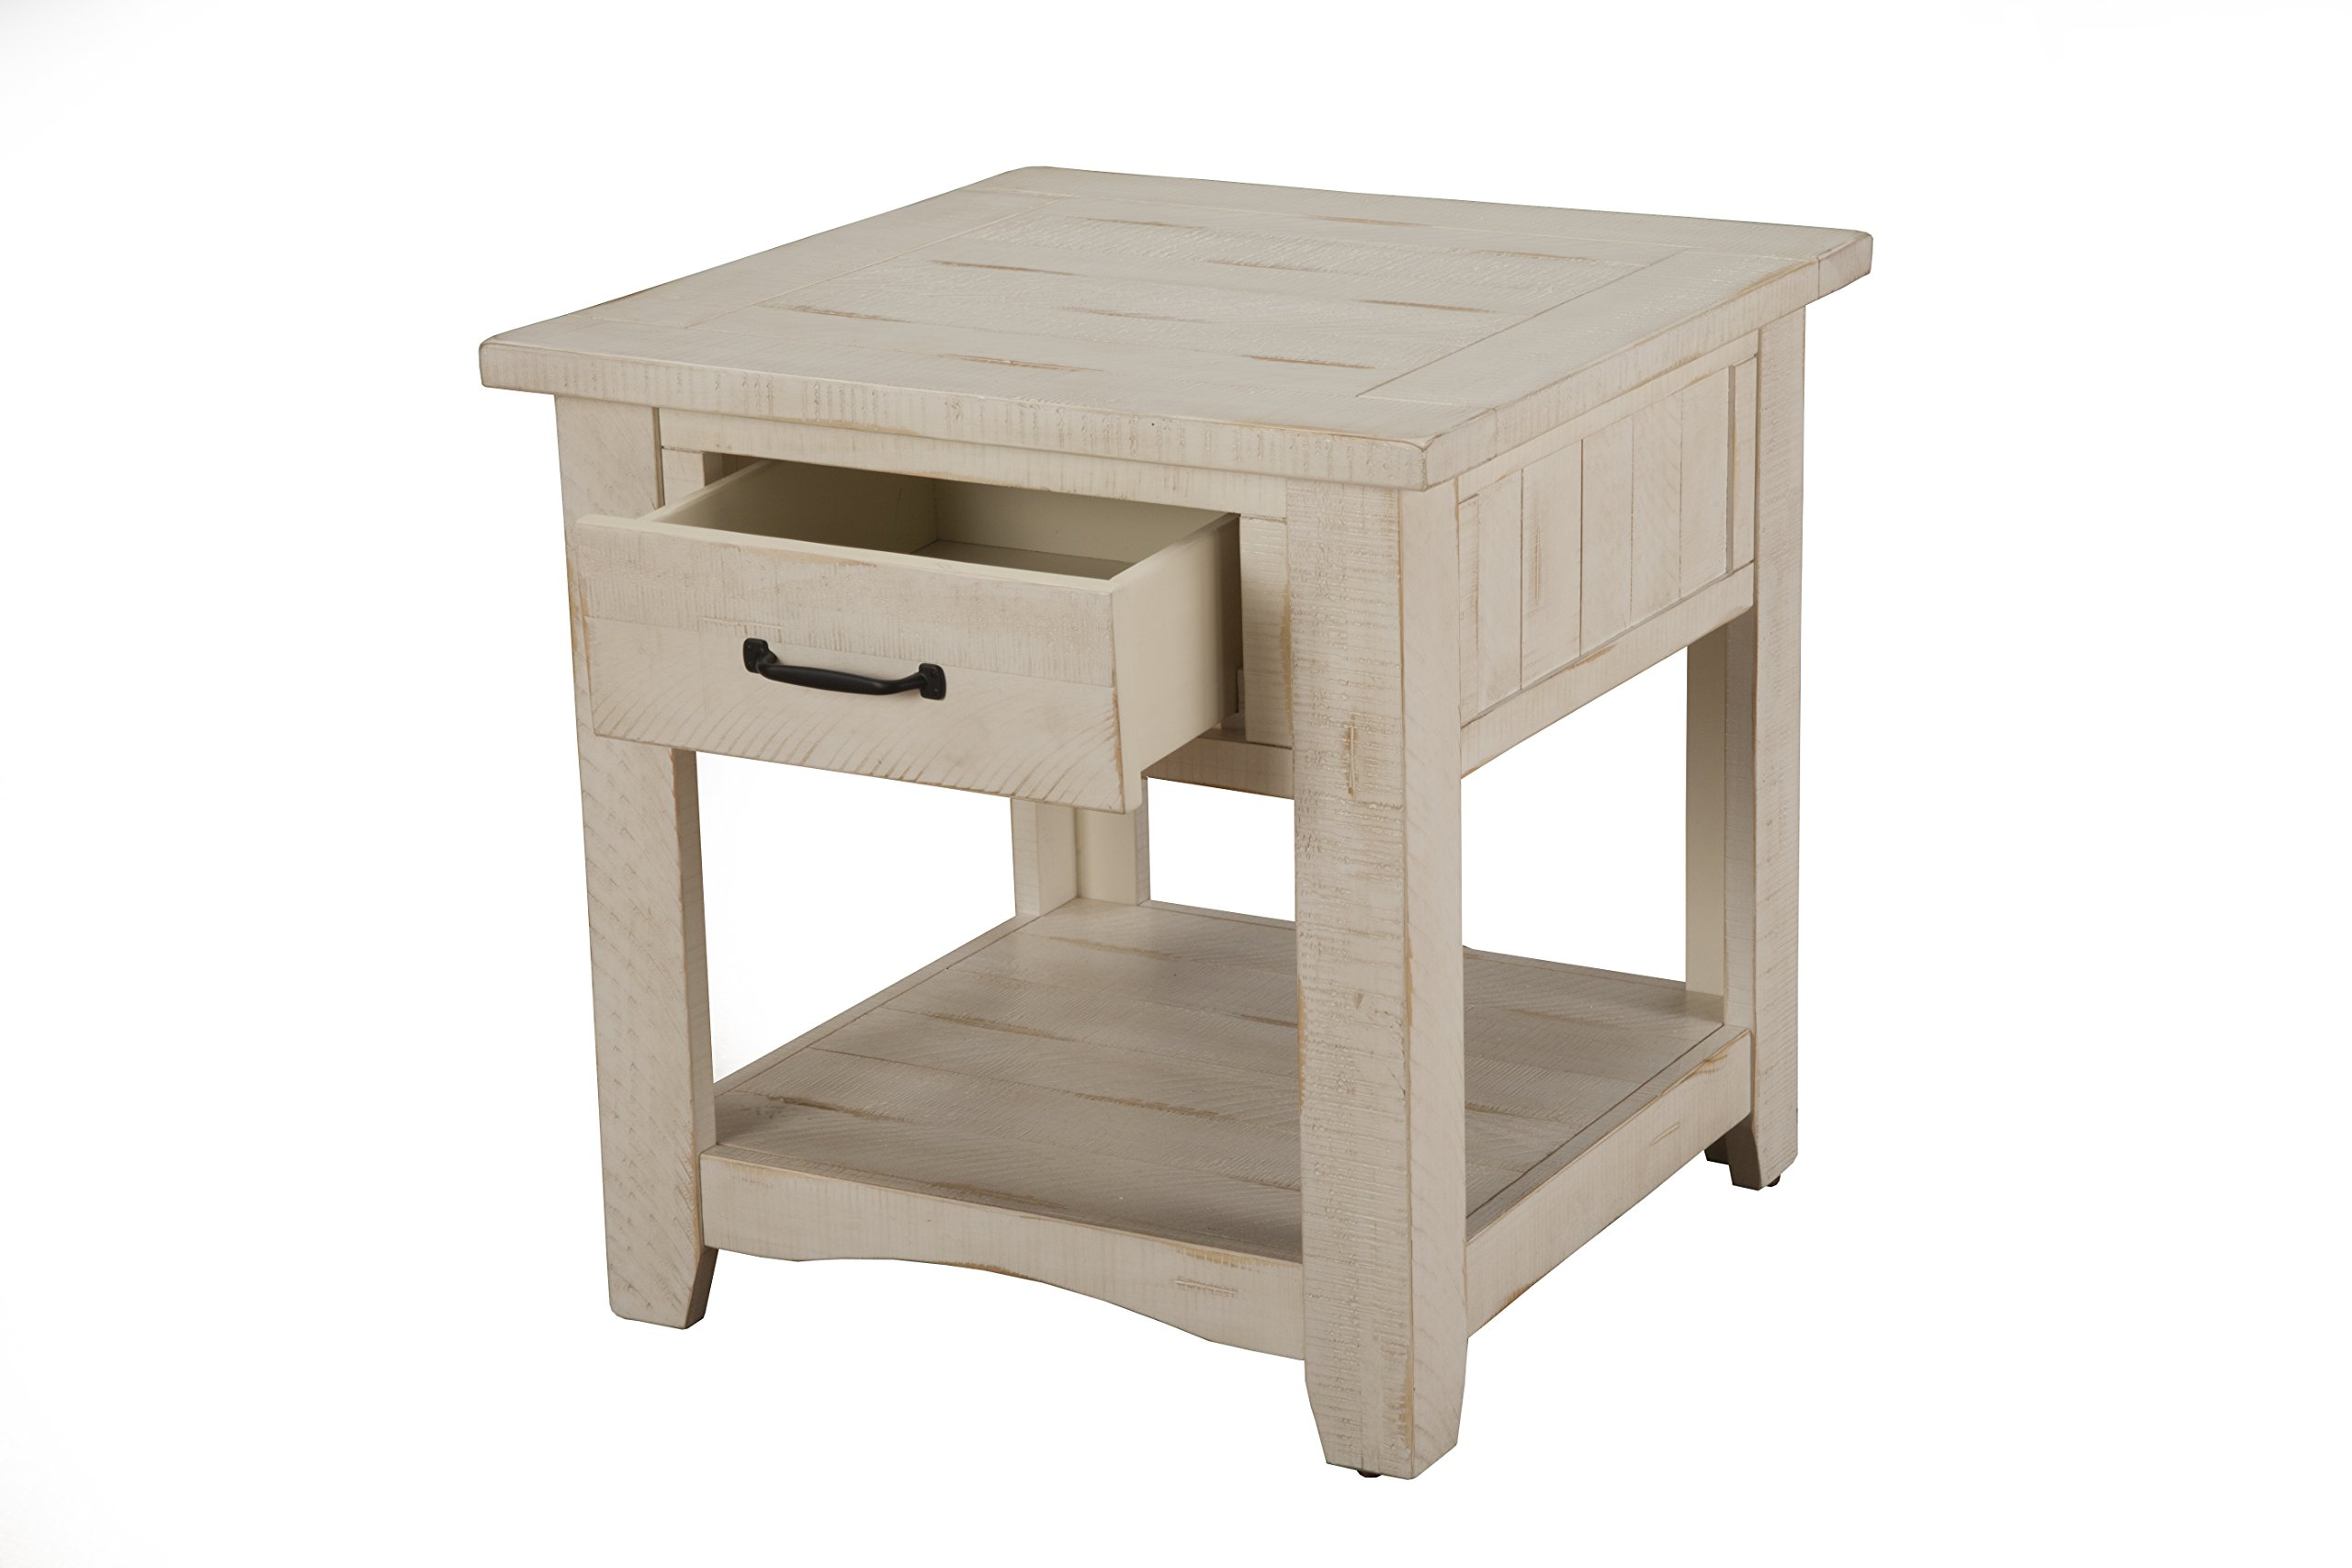 Martin Svensson Home 890133 Rustic End Table, Antique